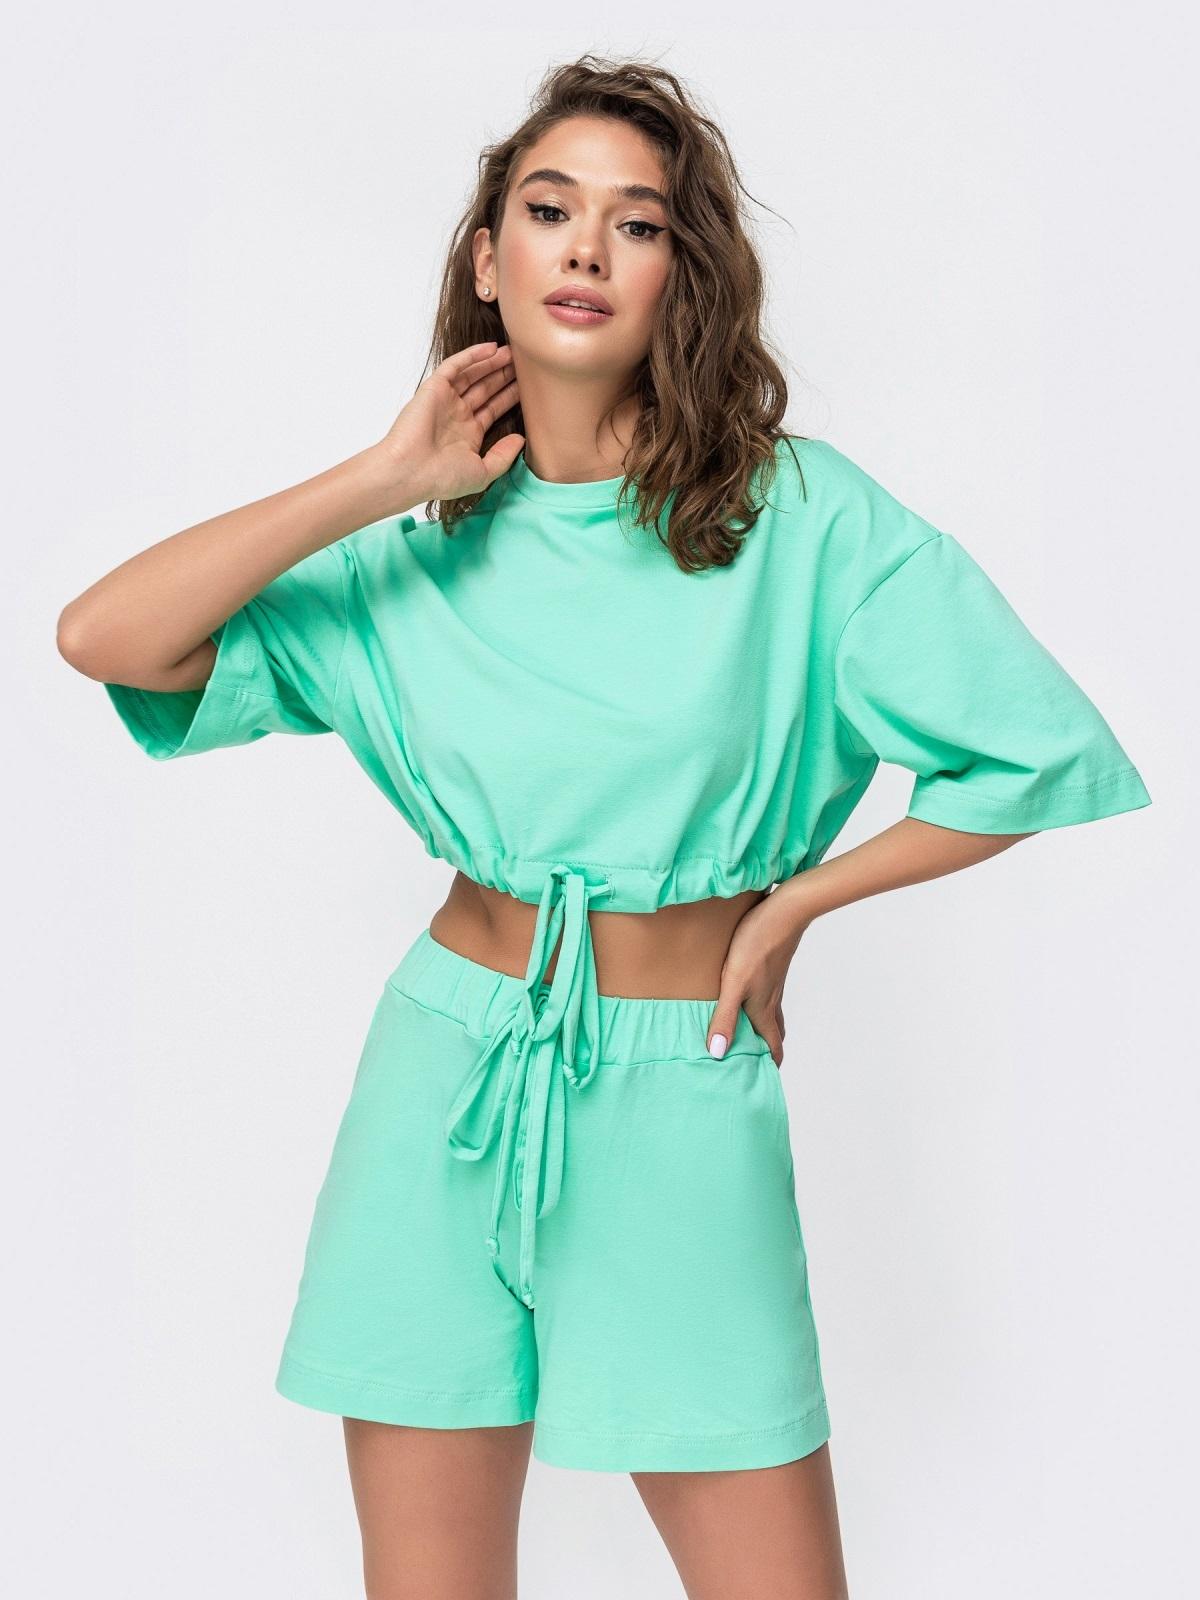 Комплект бирюзового цвета с шортами на кулиске   49347, фото 1